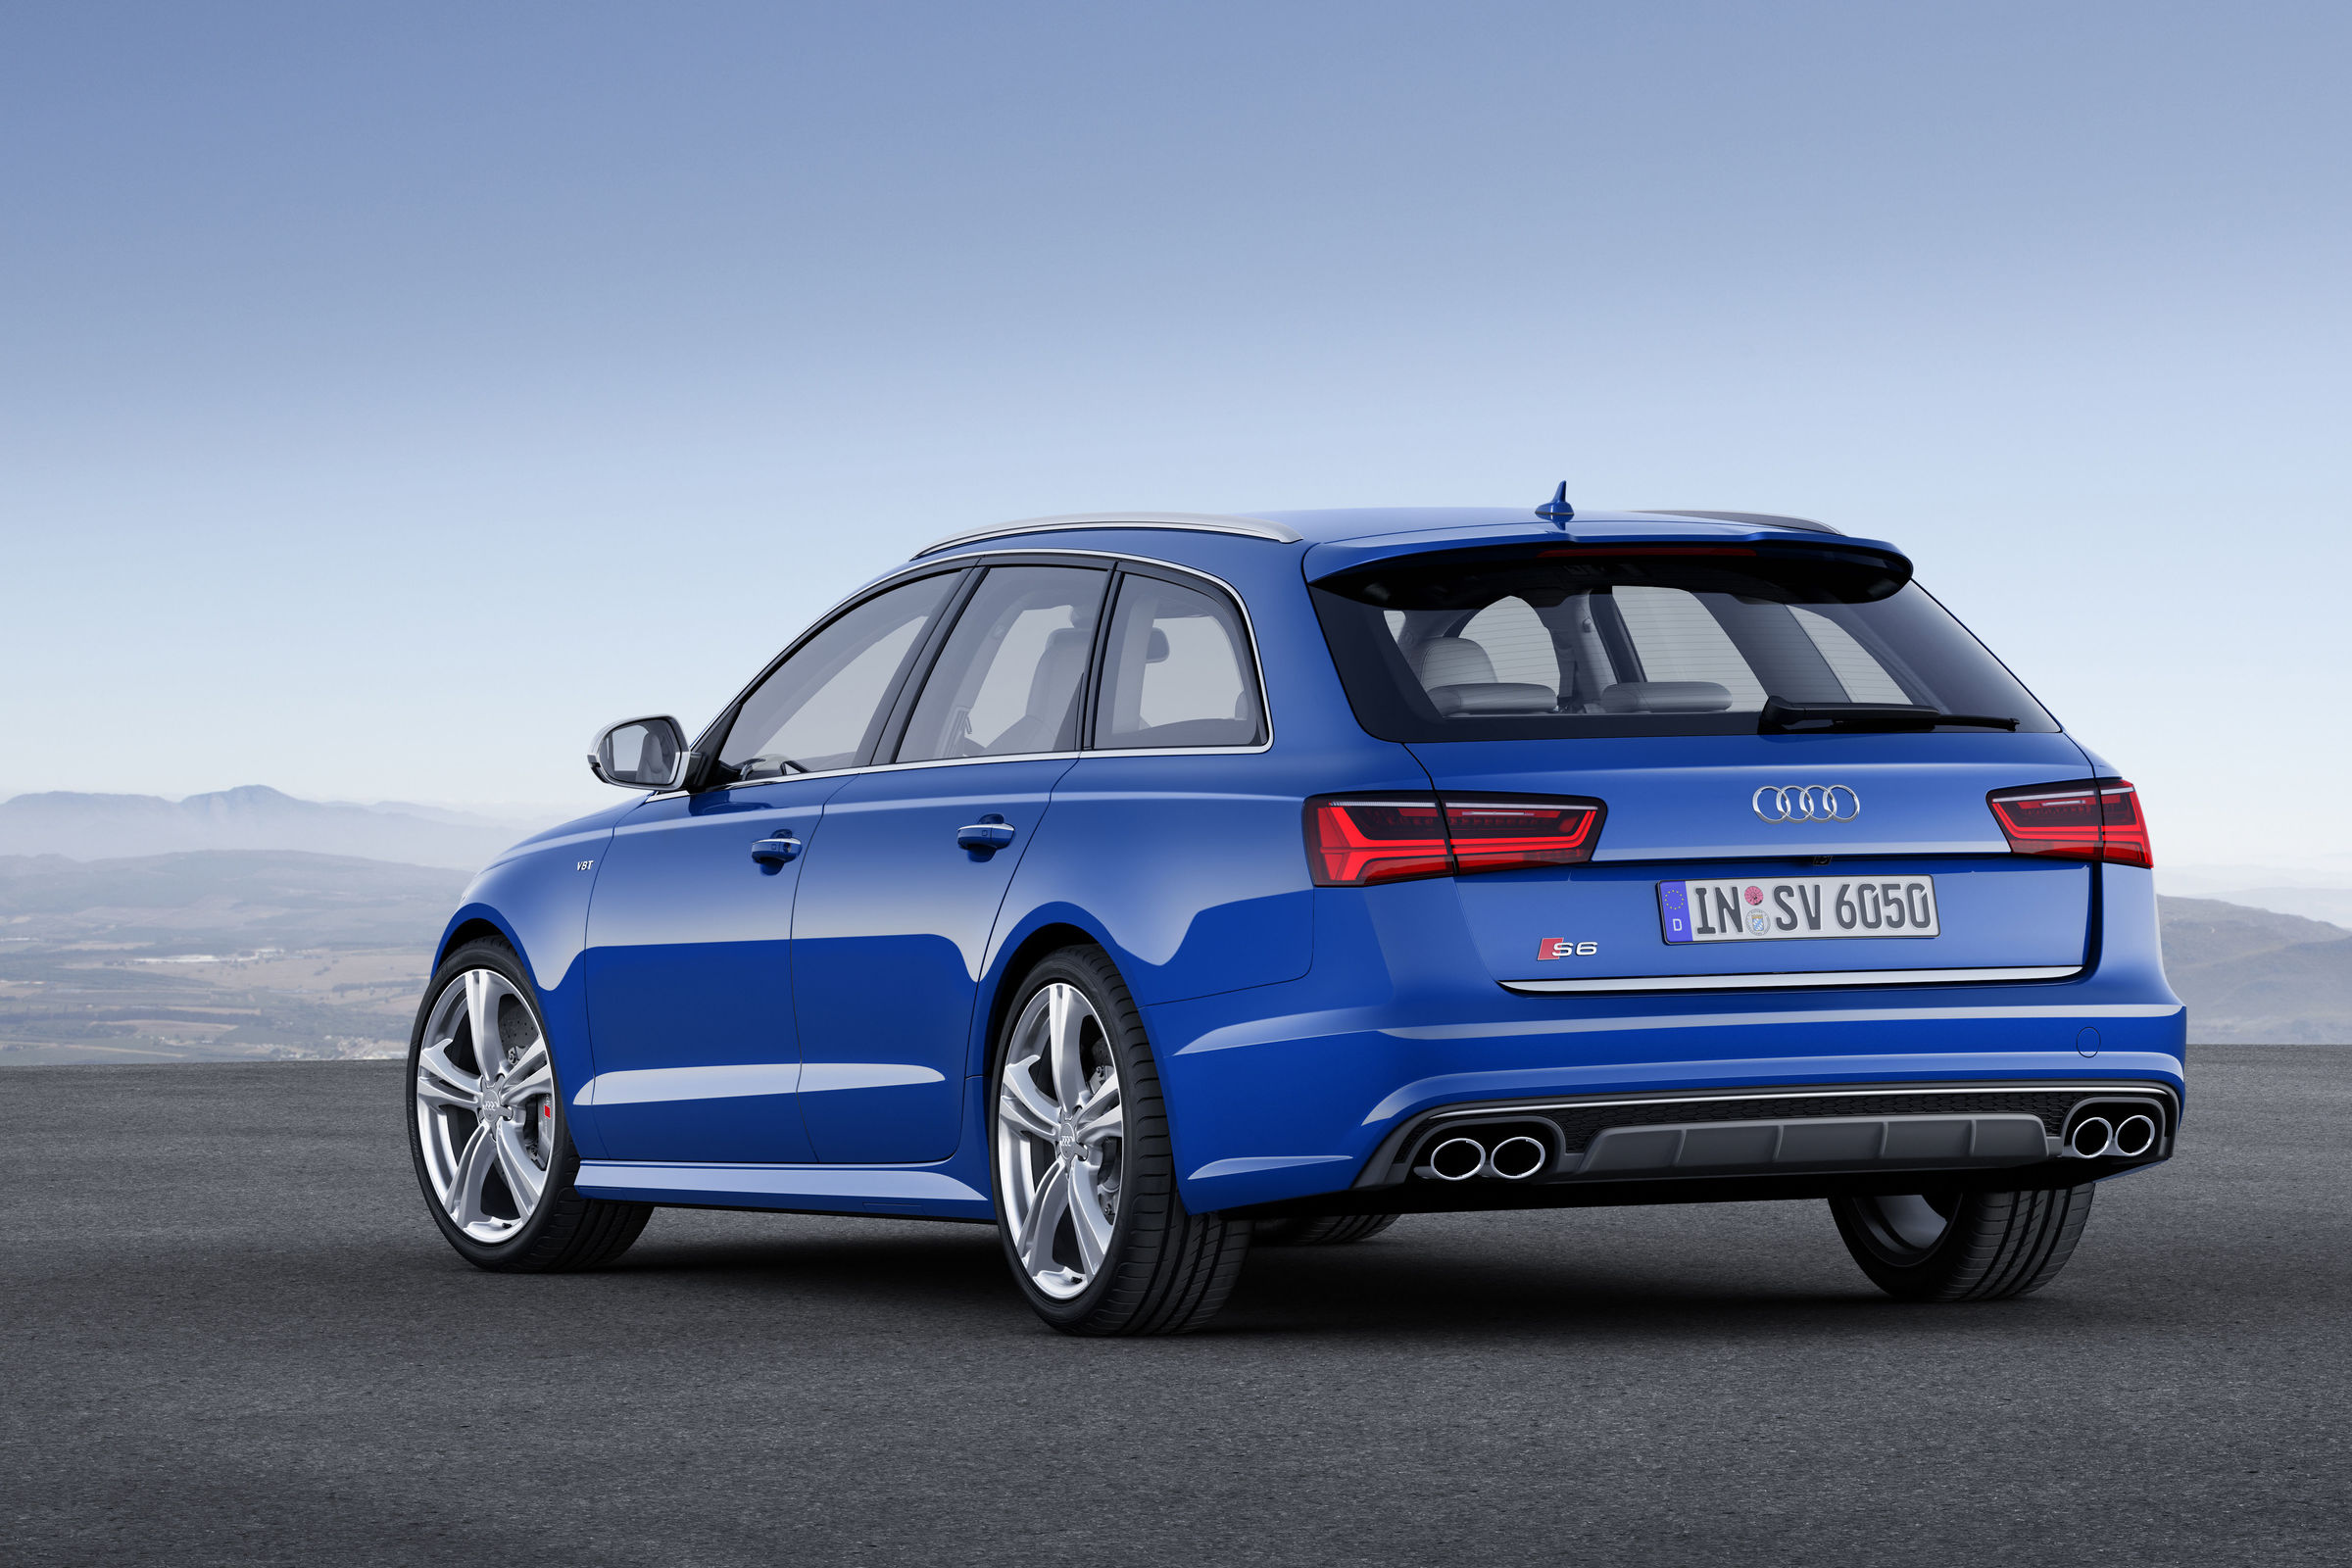 Break sportif de marque Audi